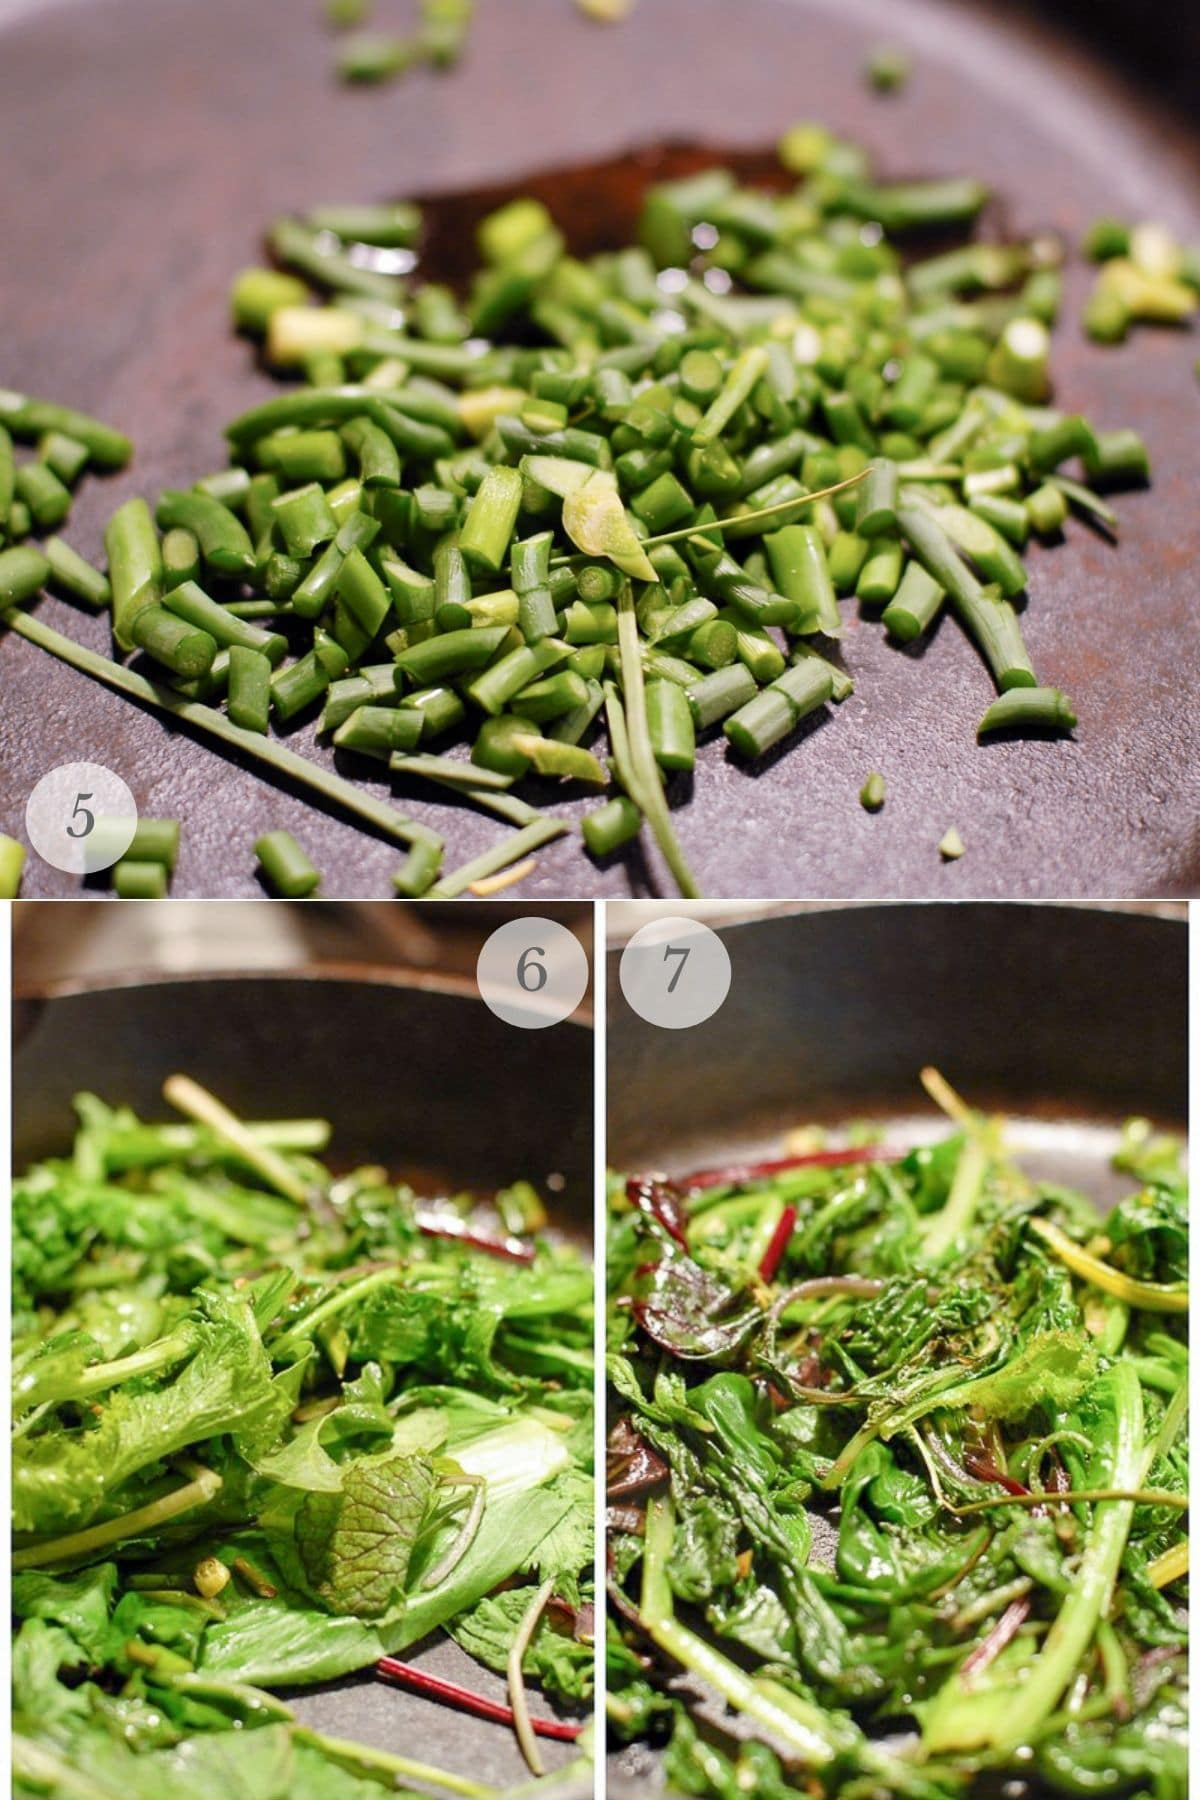 fried polenta with greens recipe steps 5-7